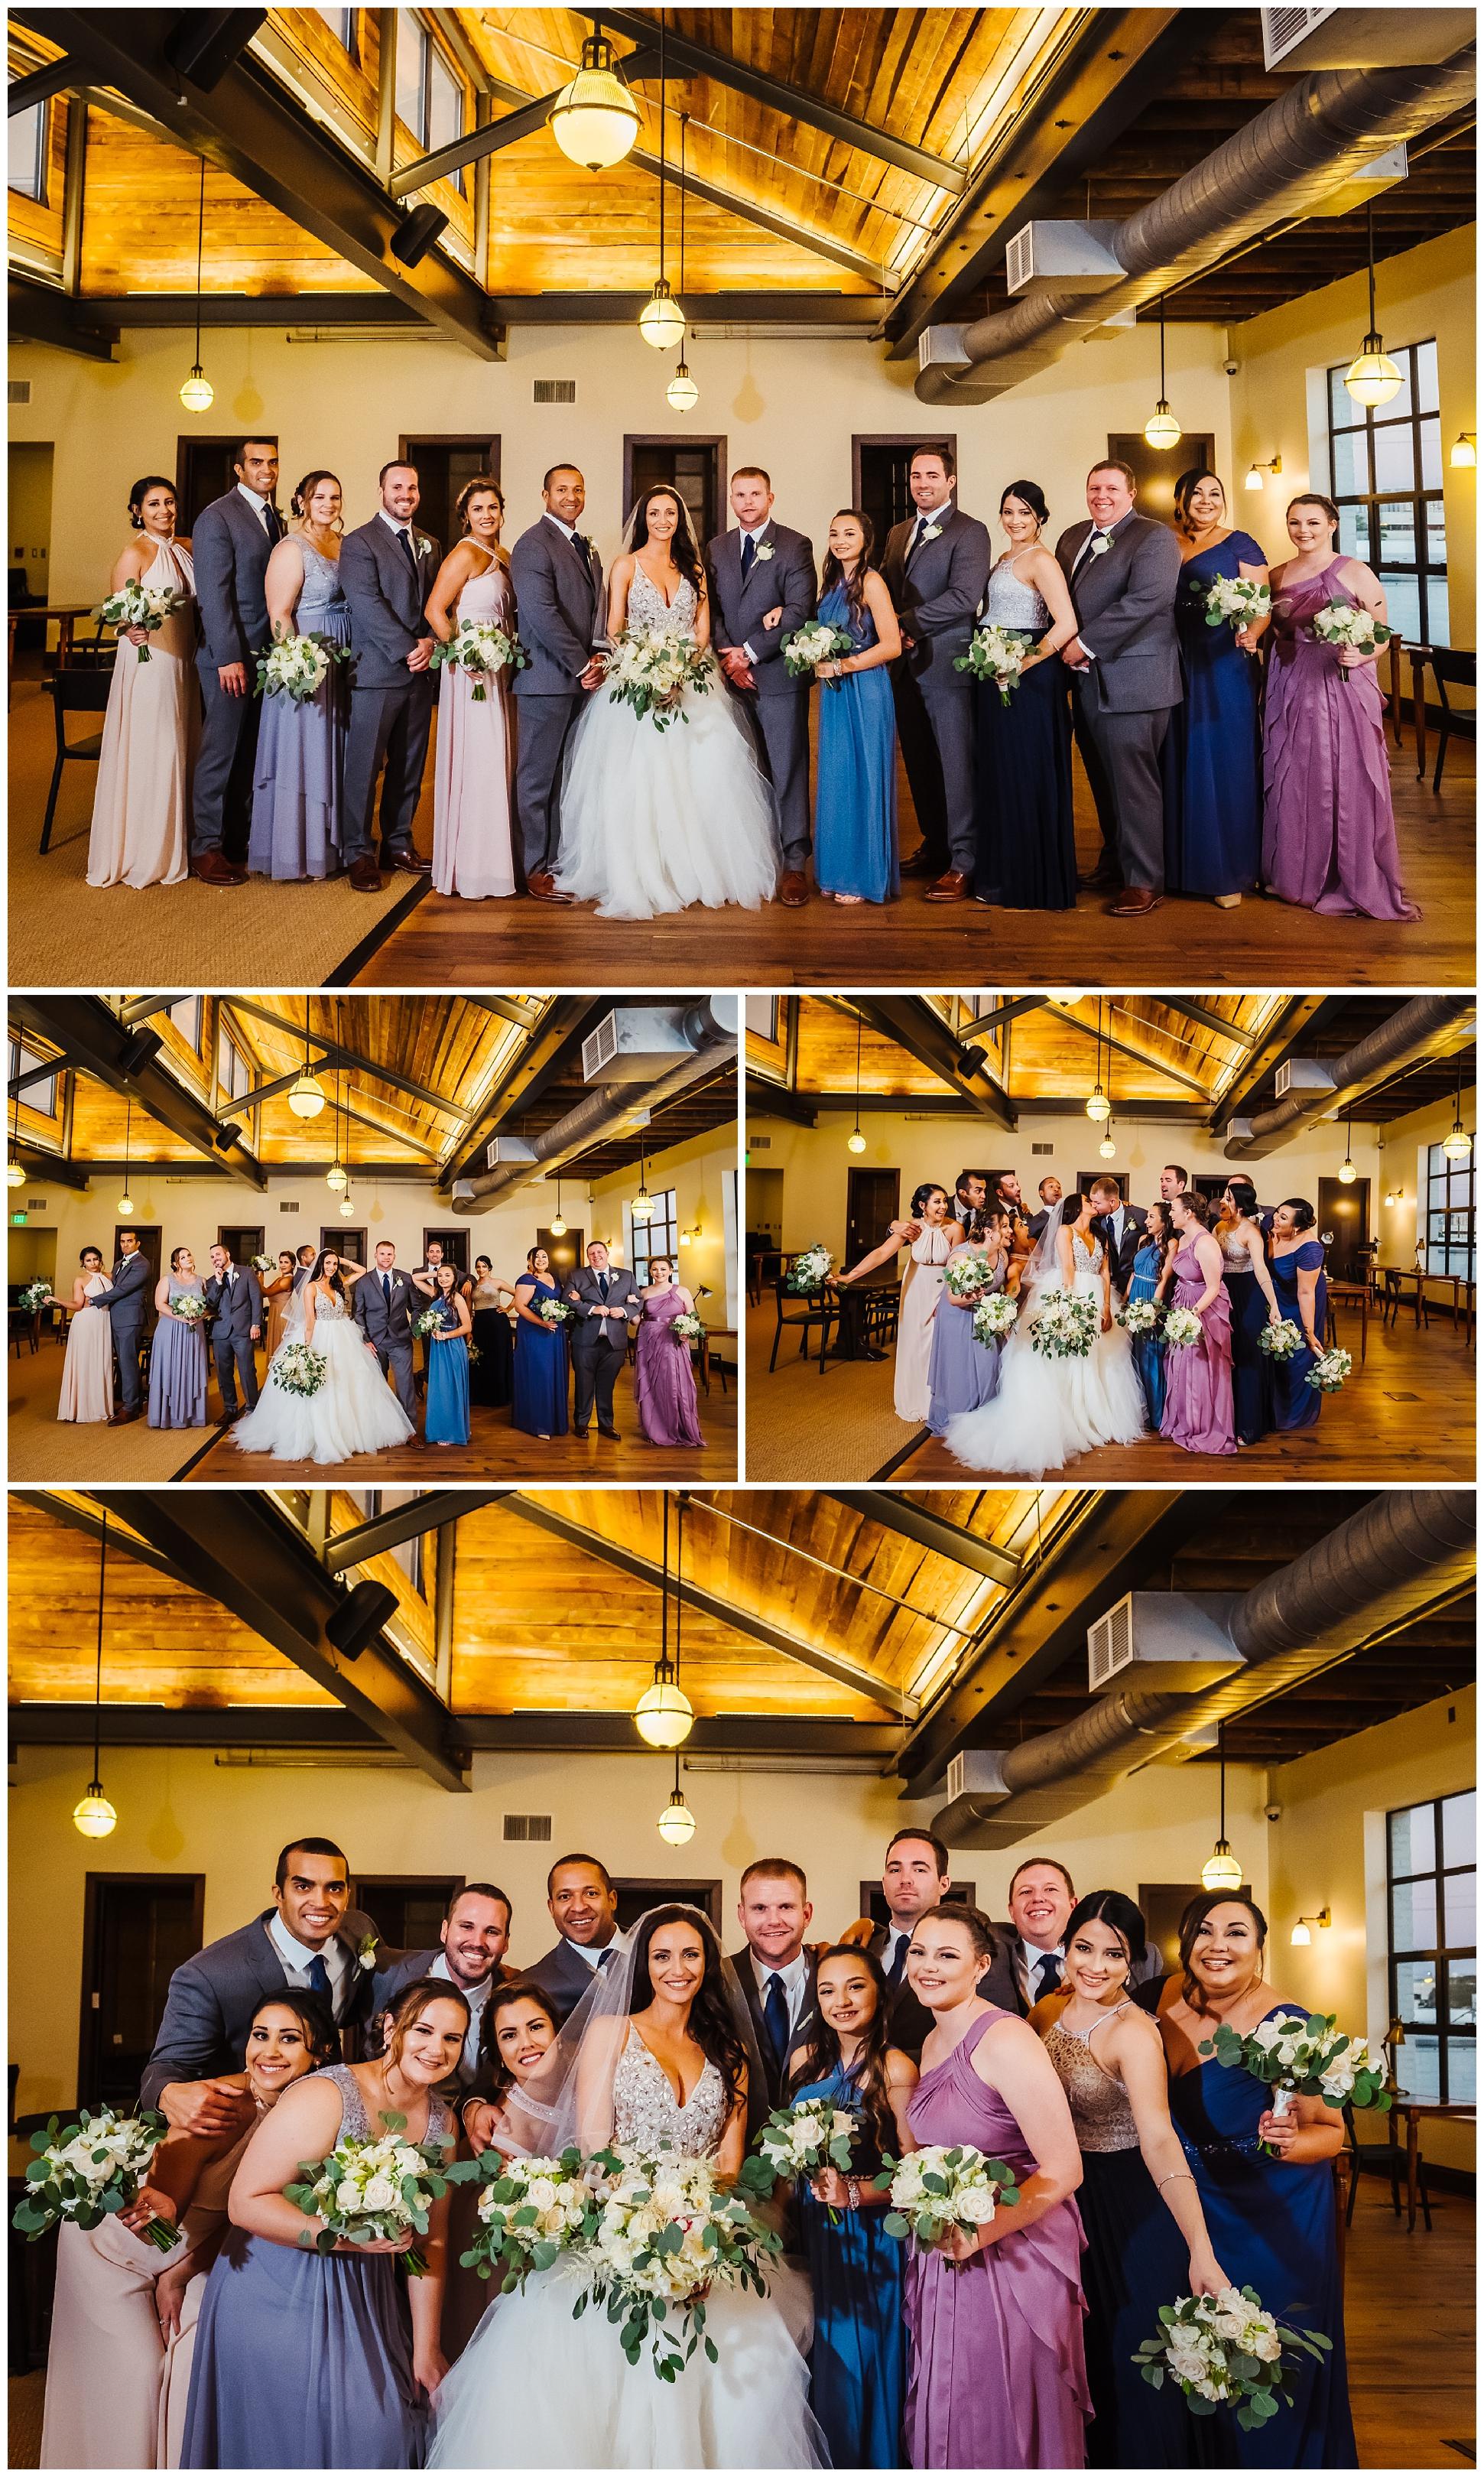 tampa-wedding-photographer-oxford-exchange-garland-candlelight-gold-hayley-paige_0037.jpg